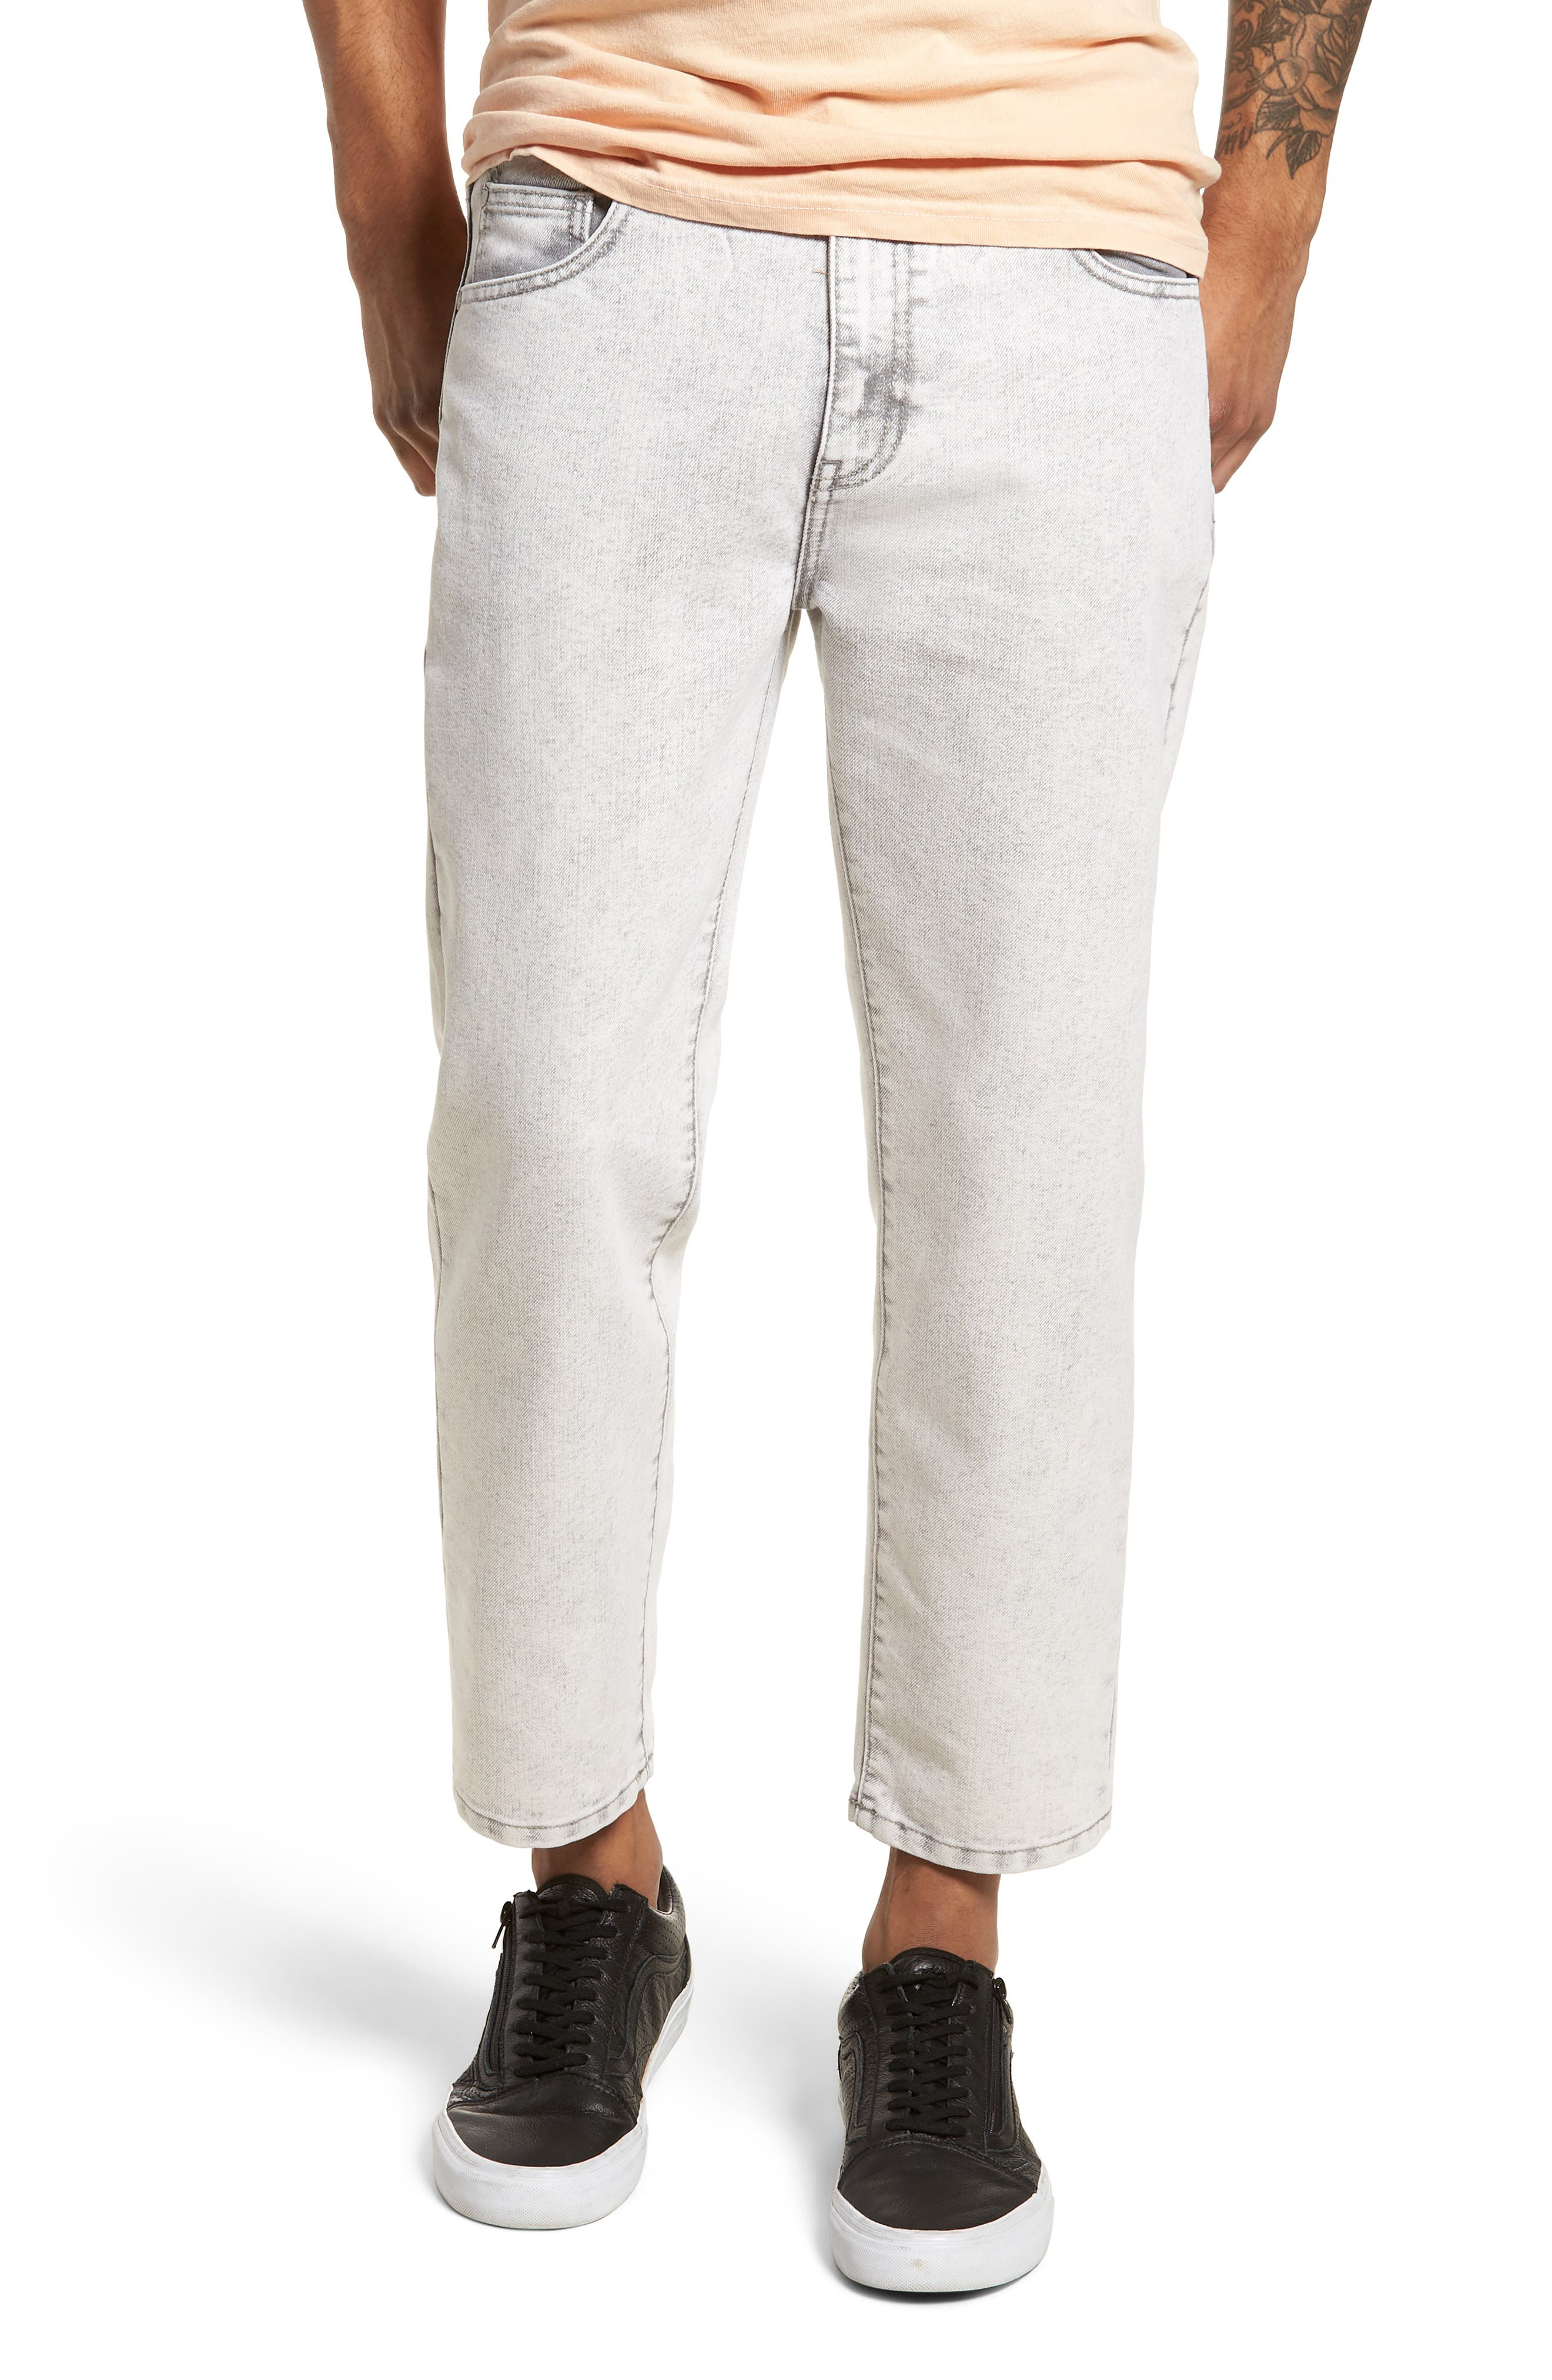 Dr. Denim Jeansmaker Otis Straight Fit Jeans,                         Main,                         color, Dirty White